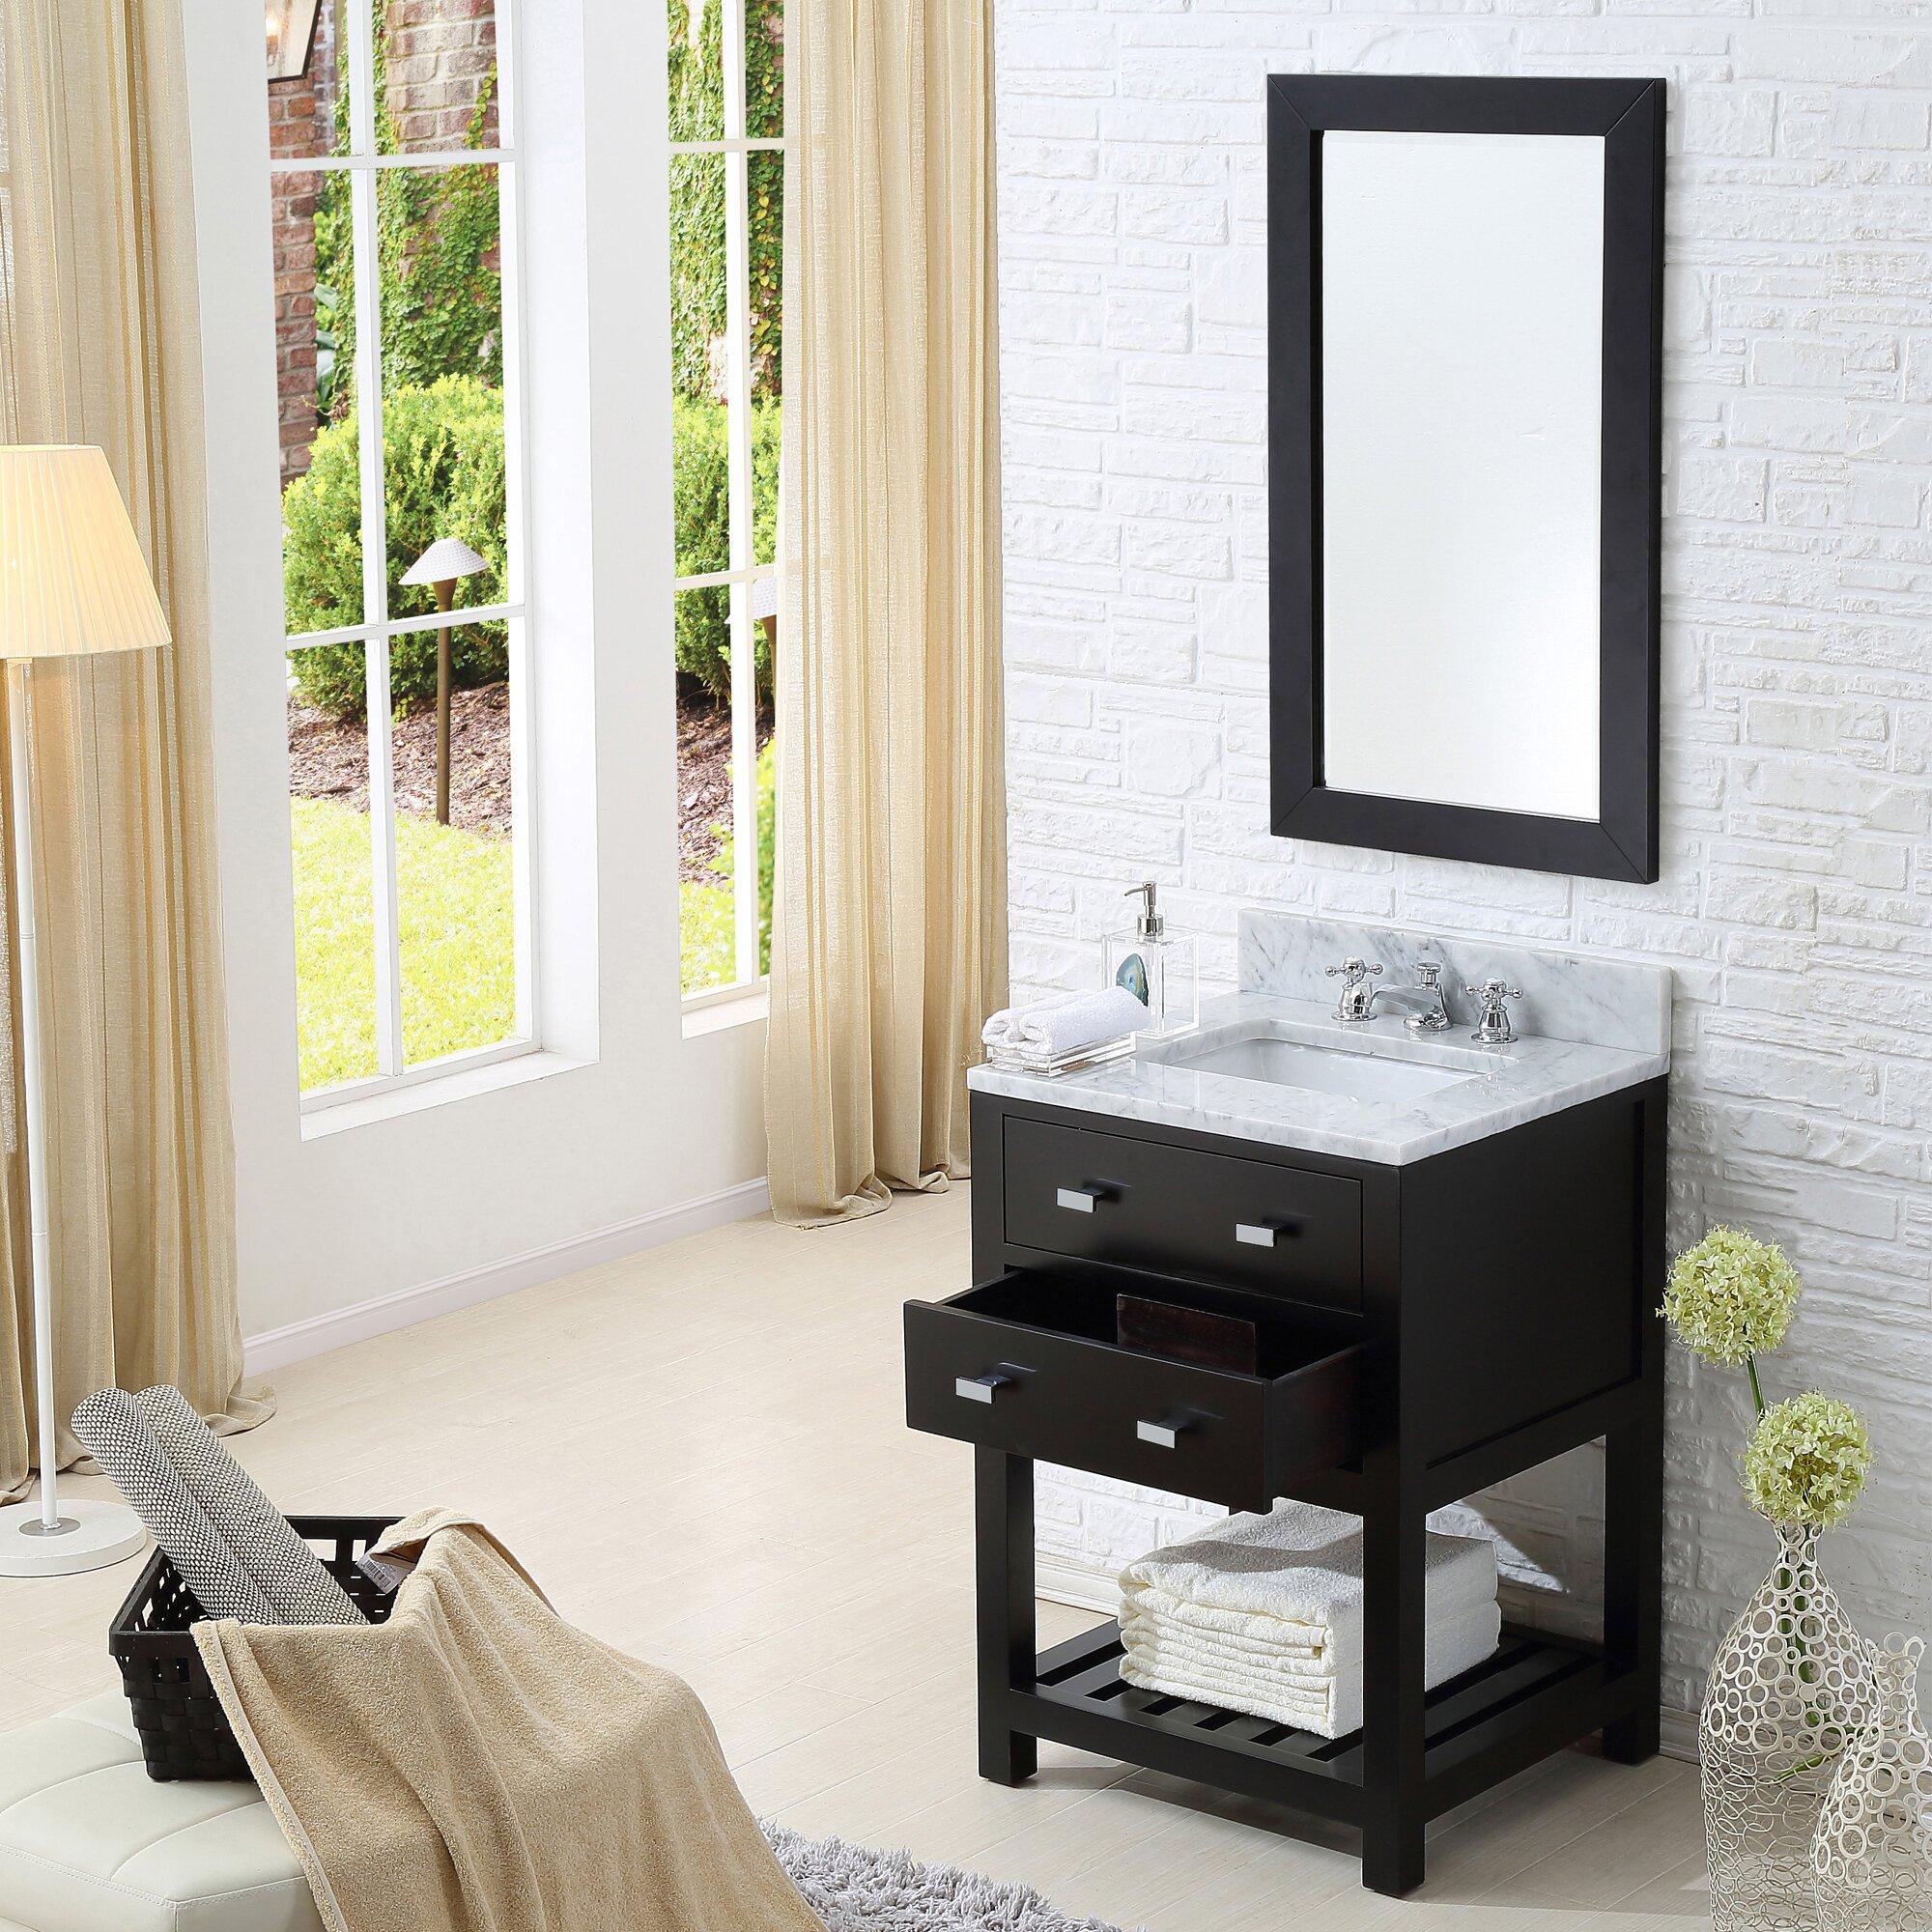 "dcor design creighton 24"" single bathroom vanity set & reviews"